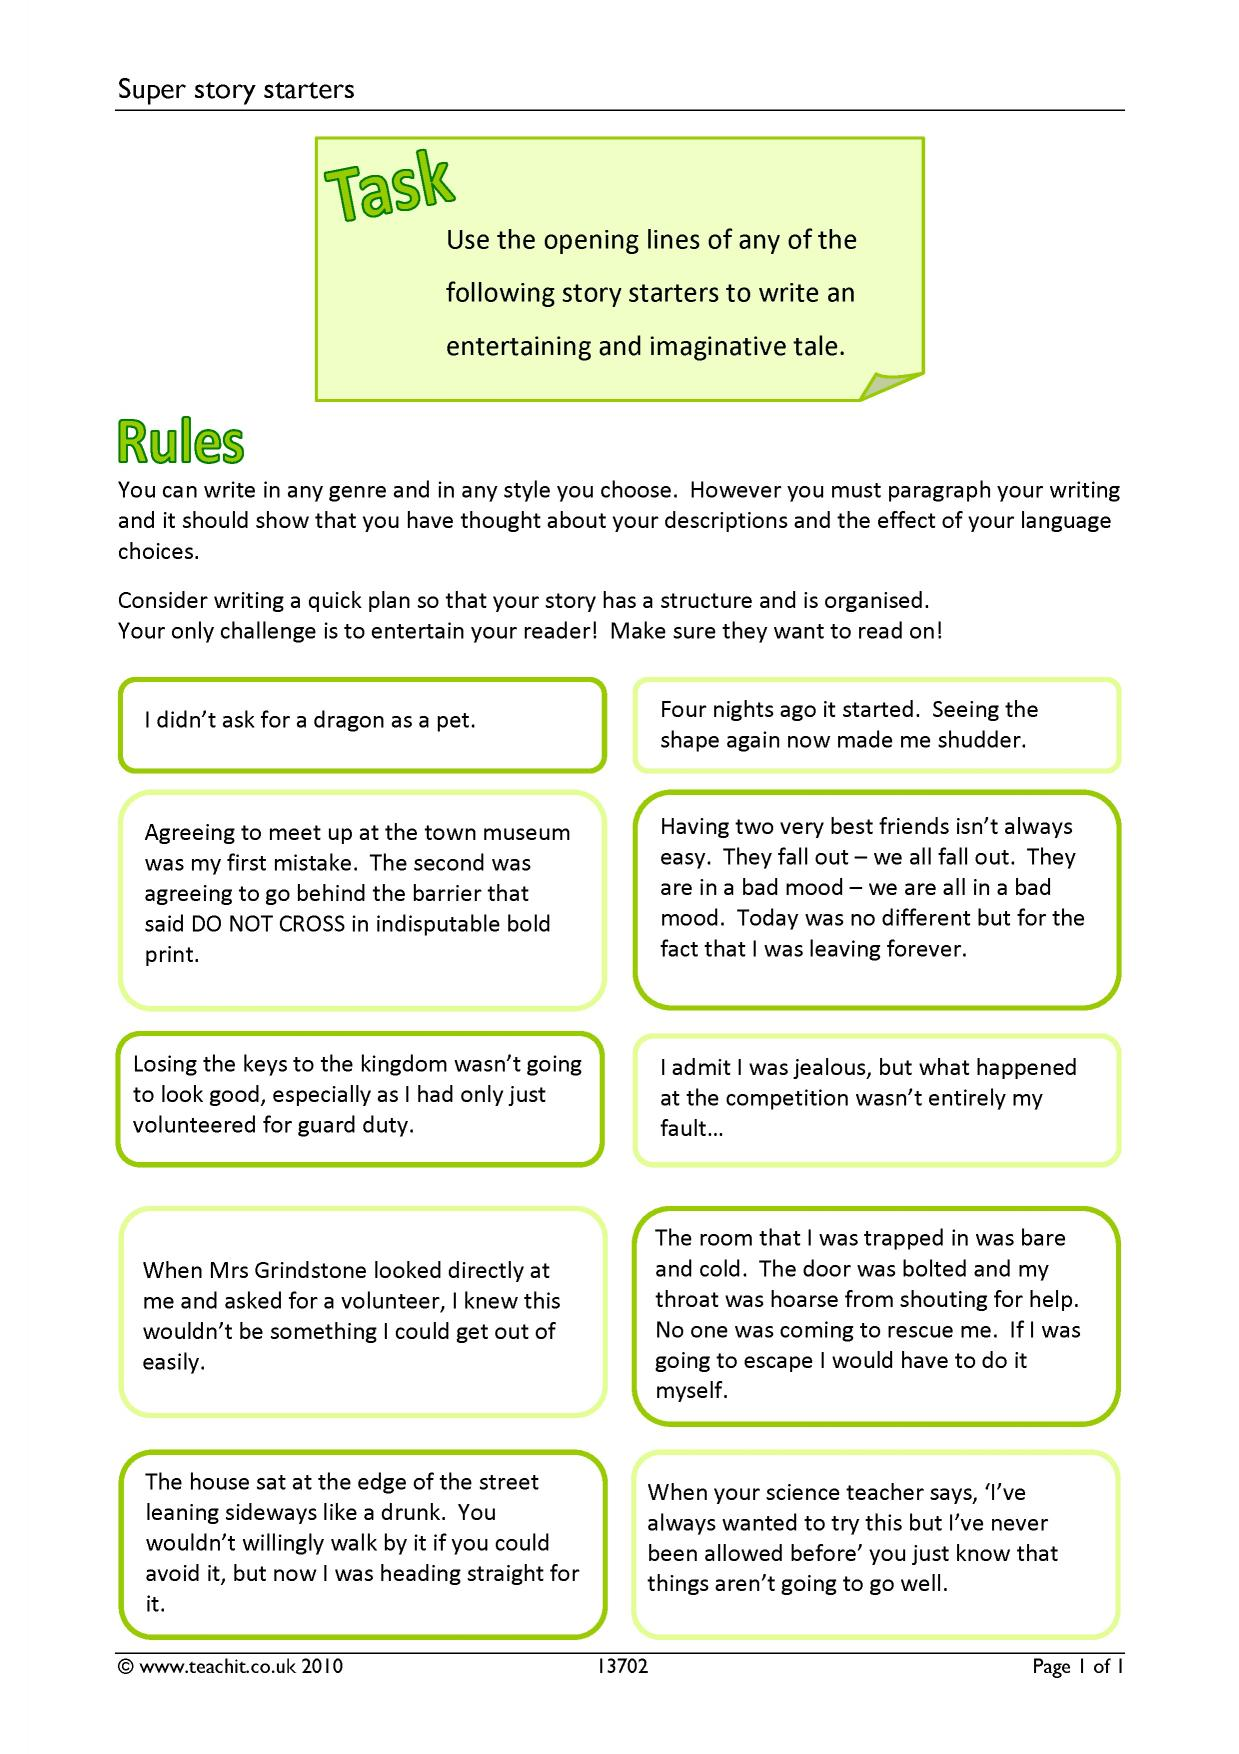 English As A World Language Essay My Dream School Essay Nursing Example Of Essay With Thesis Statement also Example Of Essay Writing In English Siddhartha Essay Conclusion Starters Science Vs Religion Essay